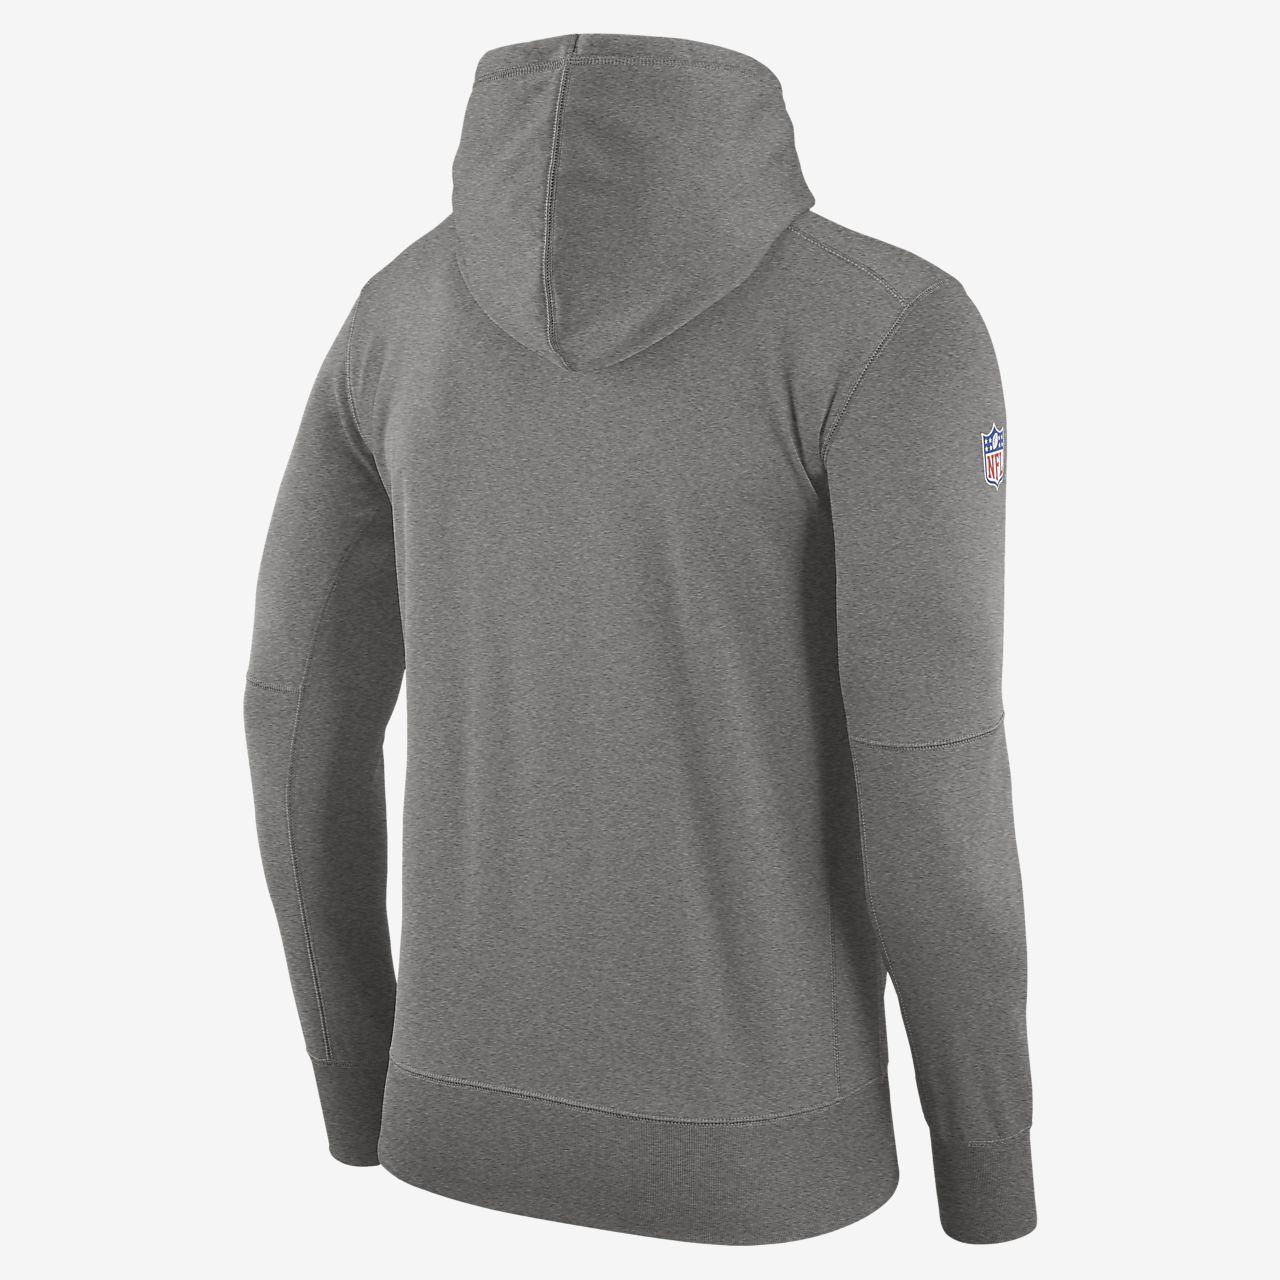 huge discount 6cf06 3824f Sweat à capuche Nike Dri-FIT Therma (NFL Steelers) pour Homme. Nike ...